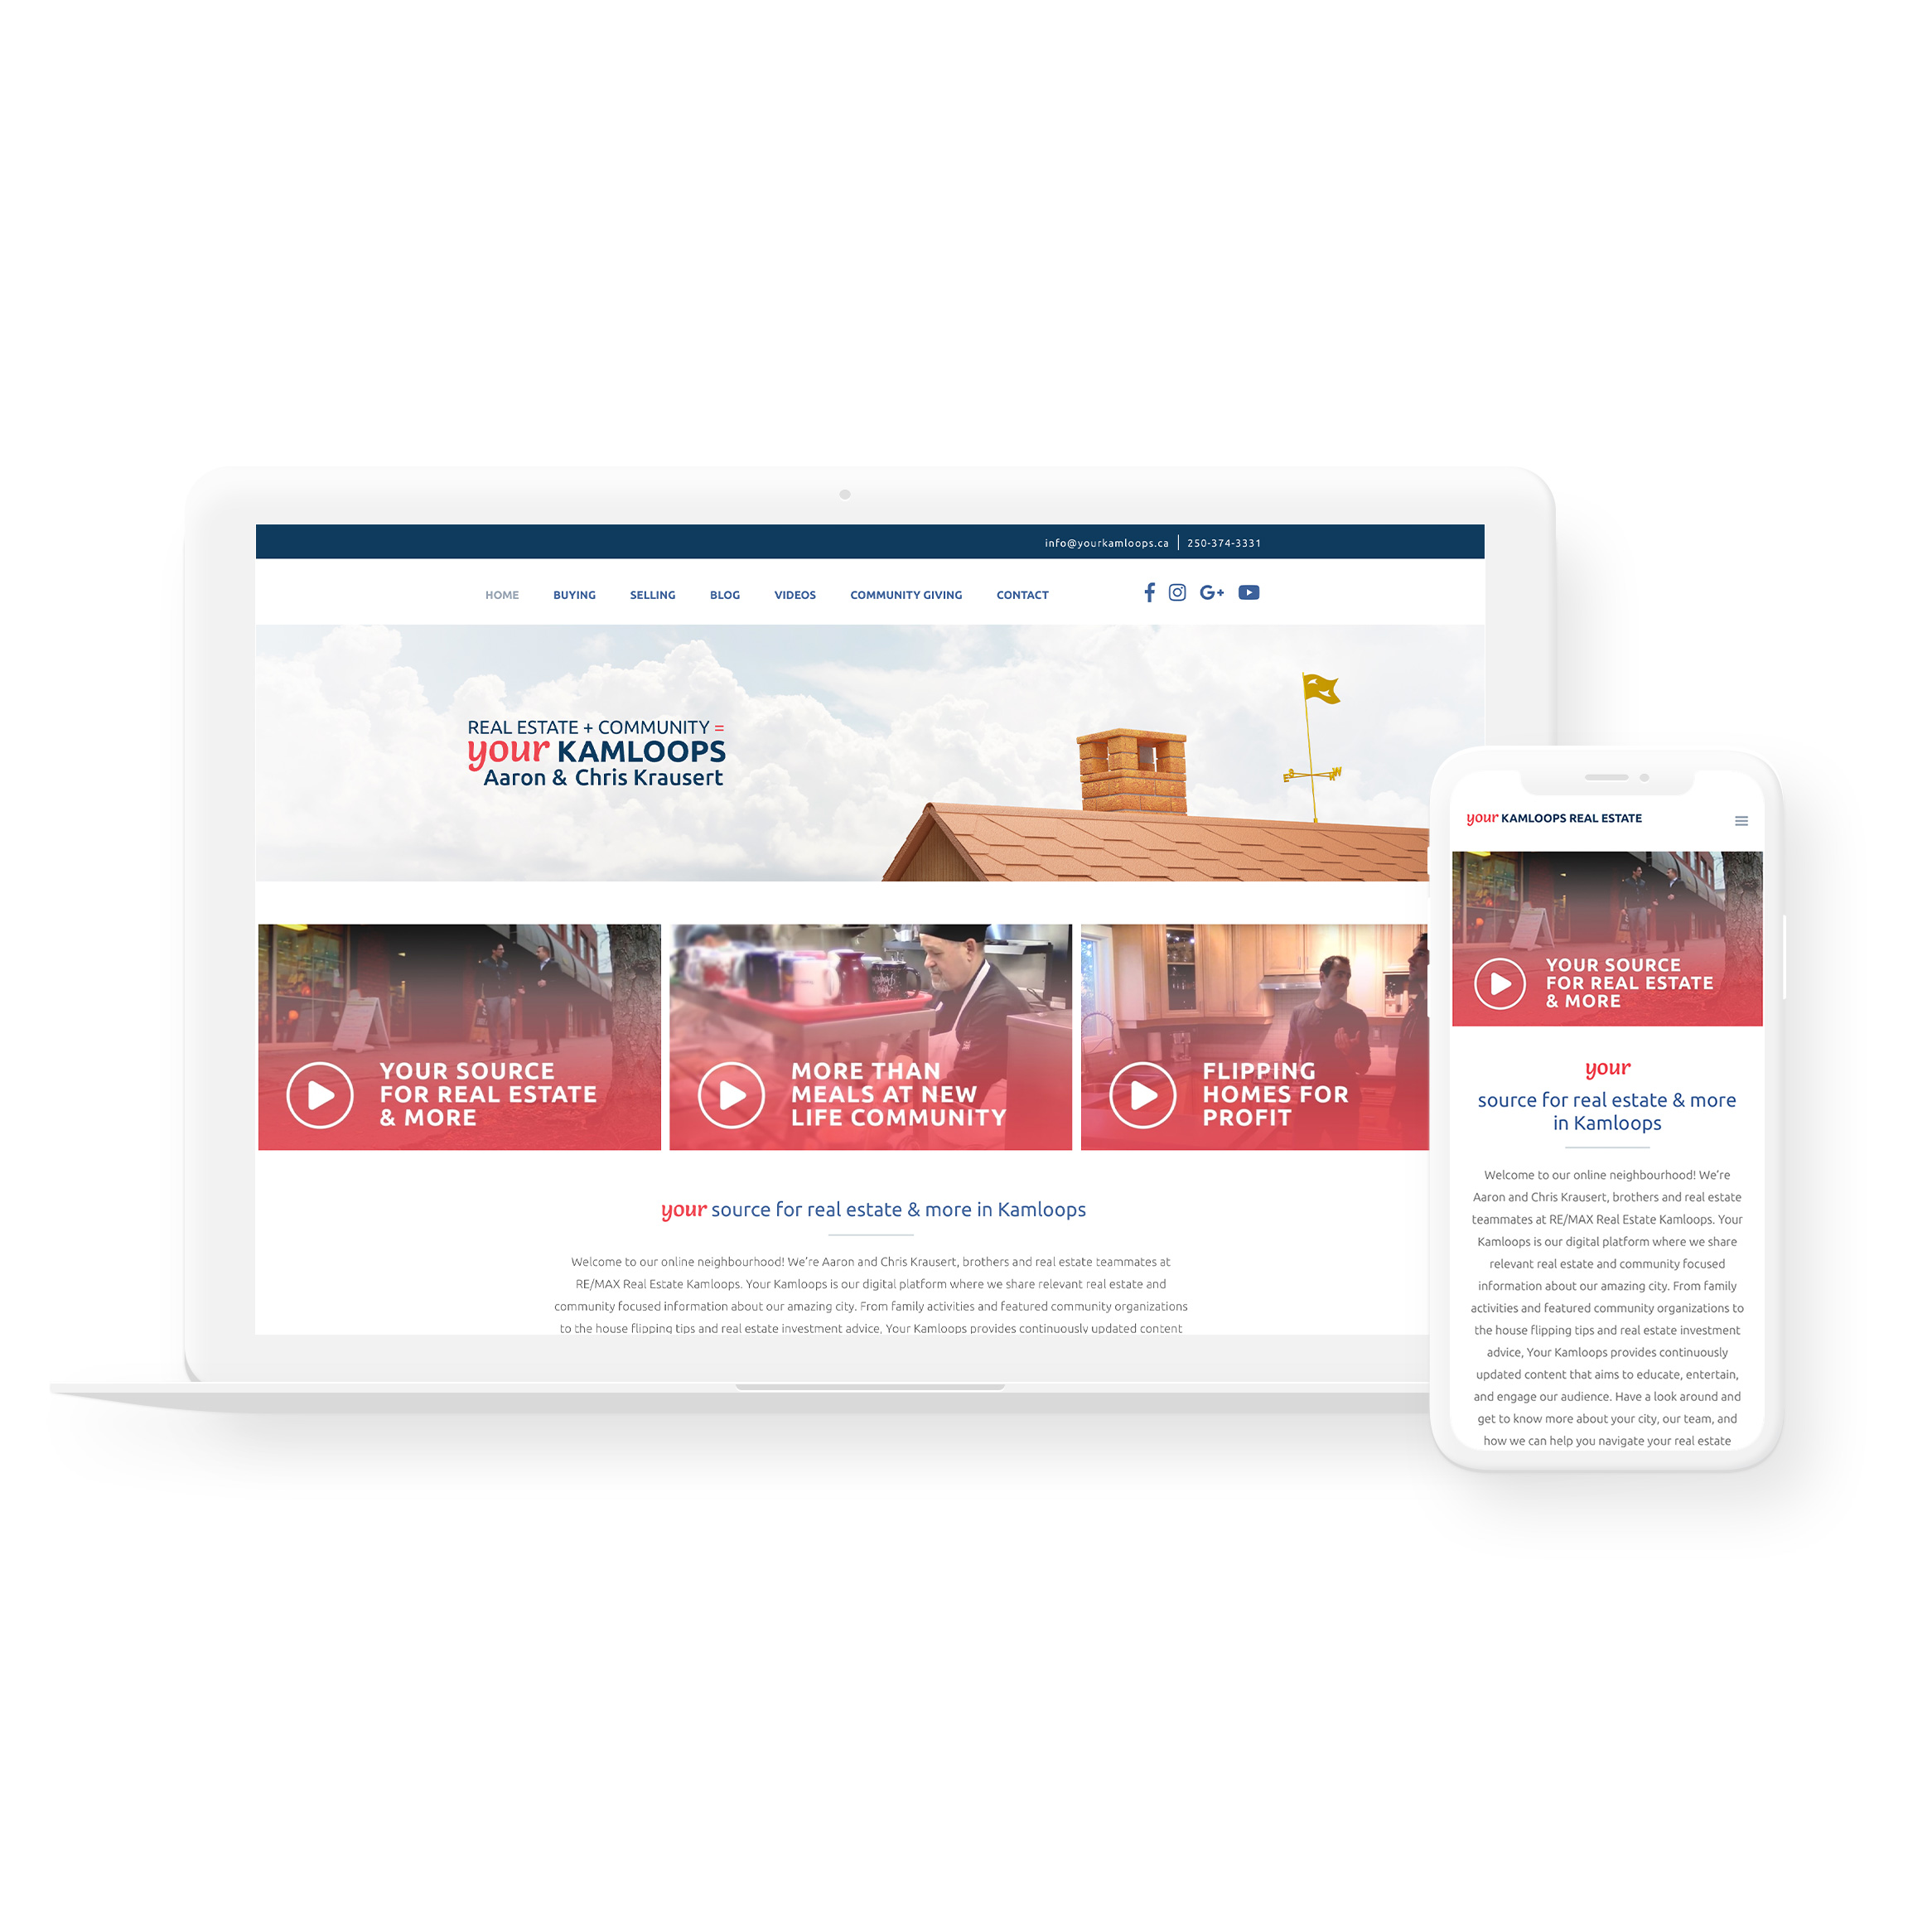 Sample image of website design showing desktop and mobile versions for Your Kamloops